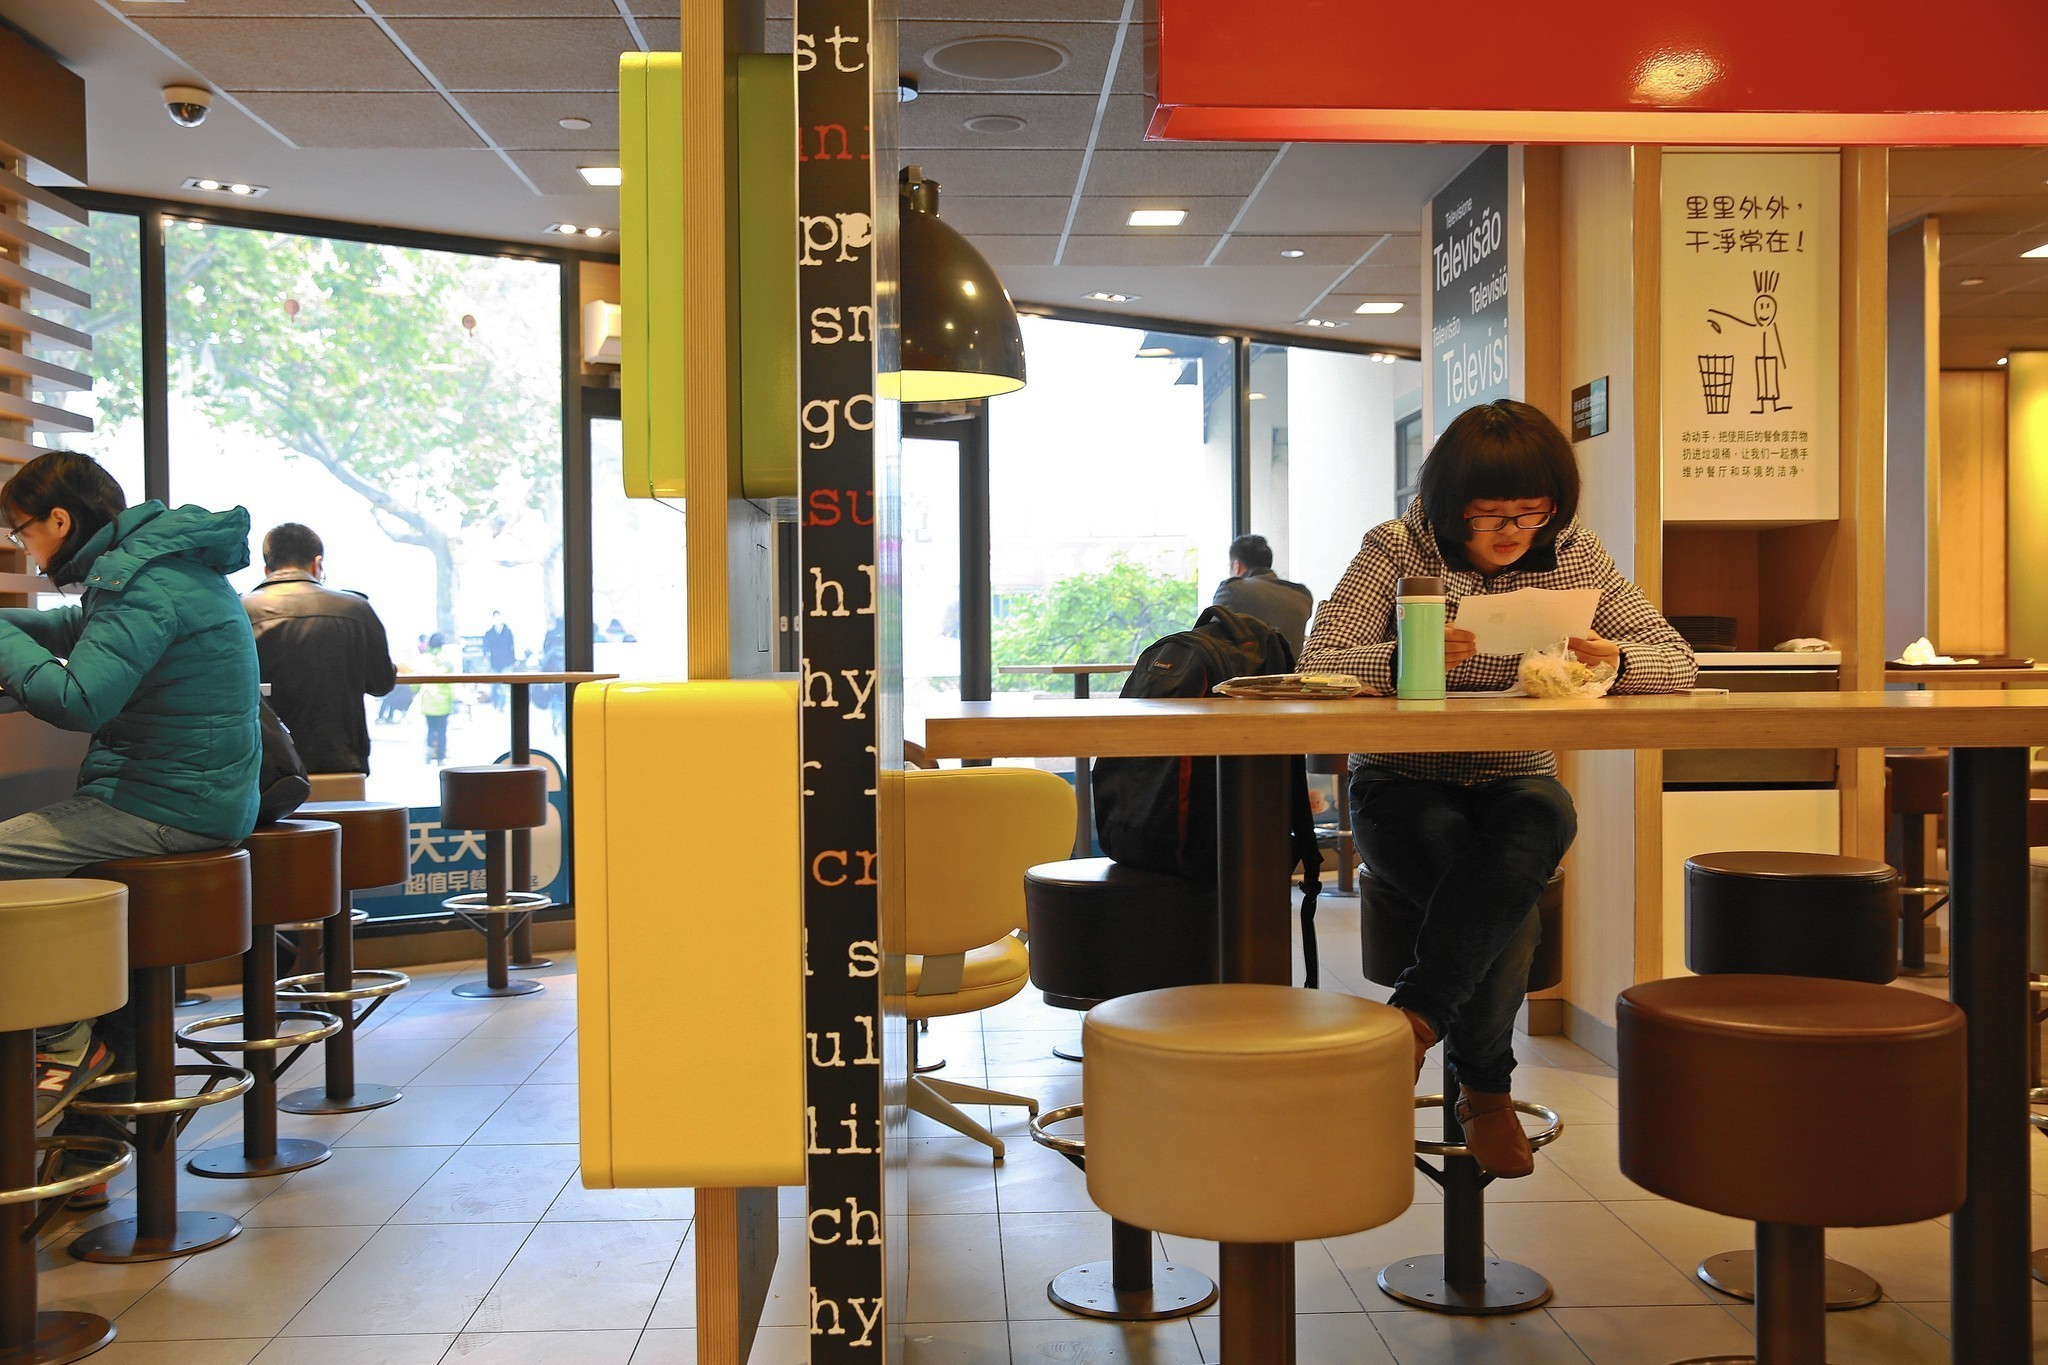 McDonald's plans 1,500 new restaurants in Asia - Chicago ...